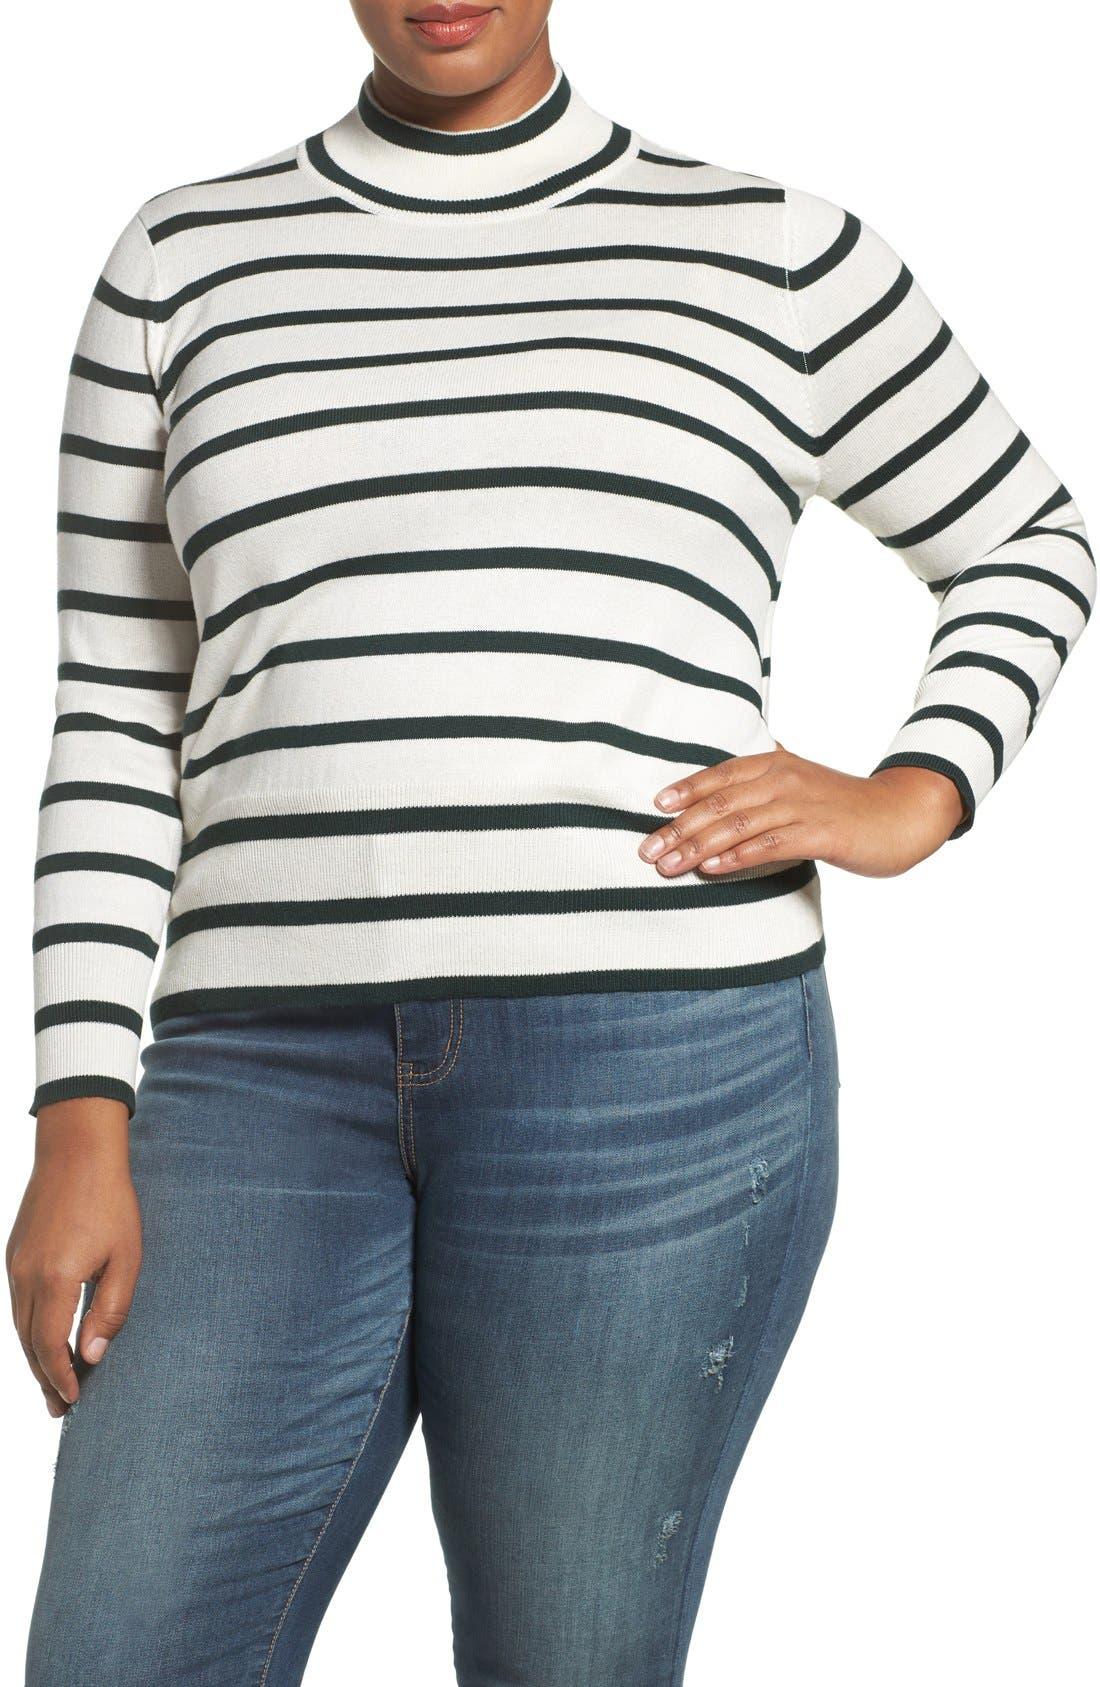 MELISSA MCCARTHY SEVEN7 Stripe Mock Neck Sweater